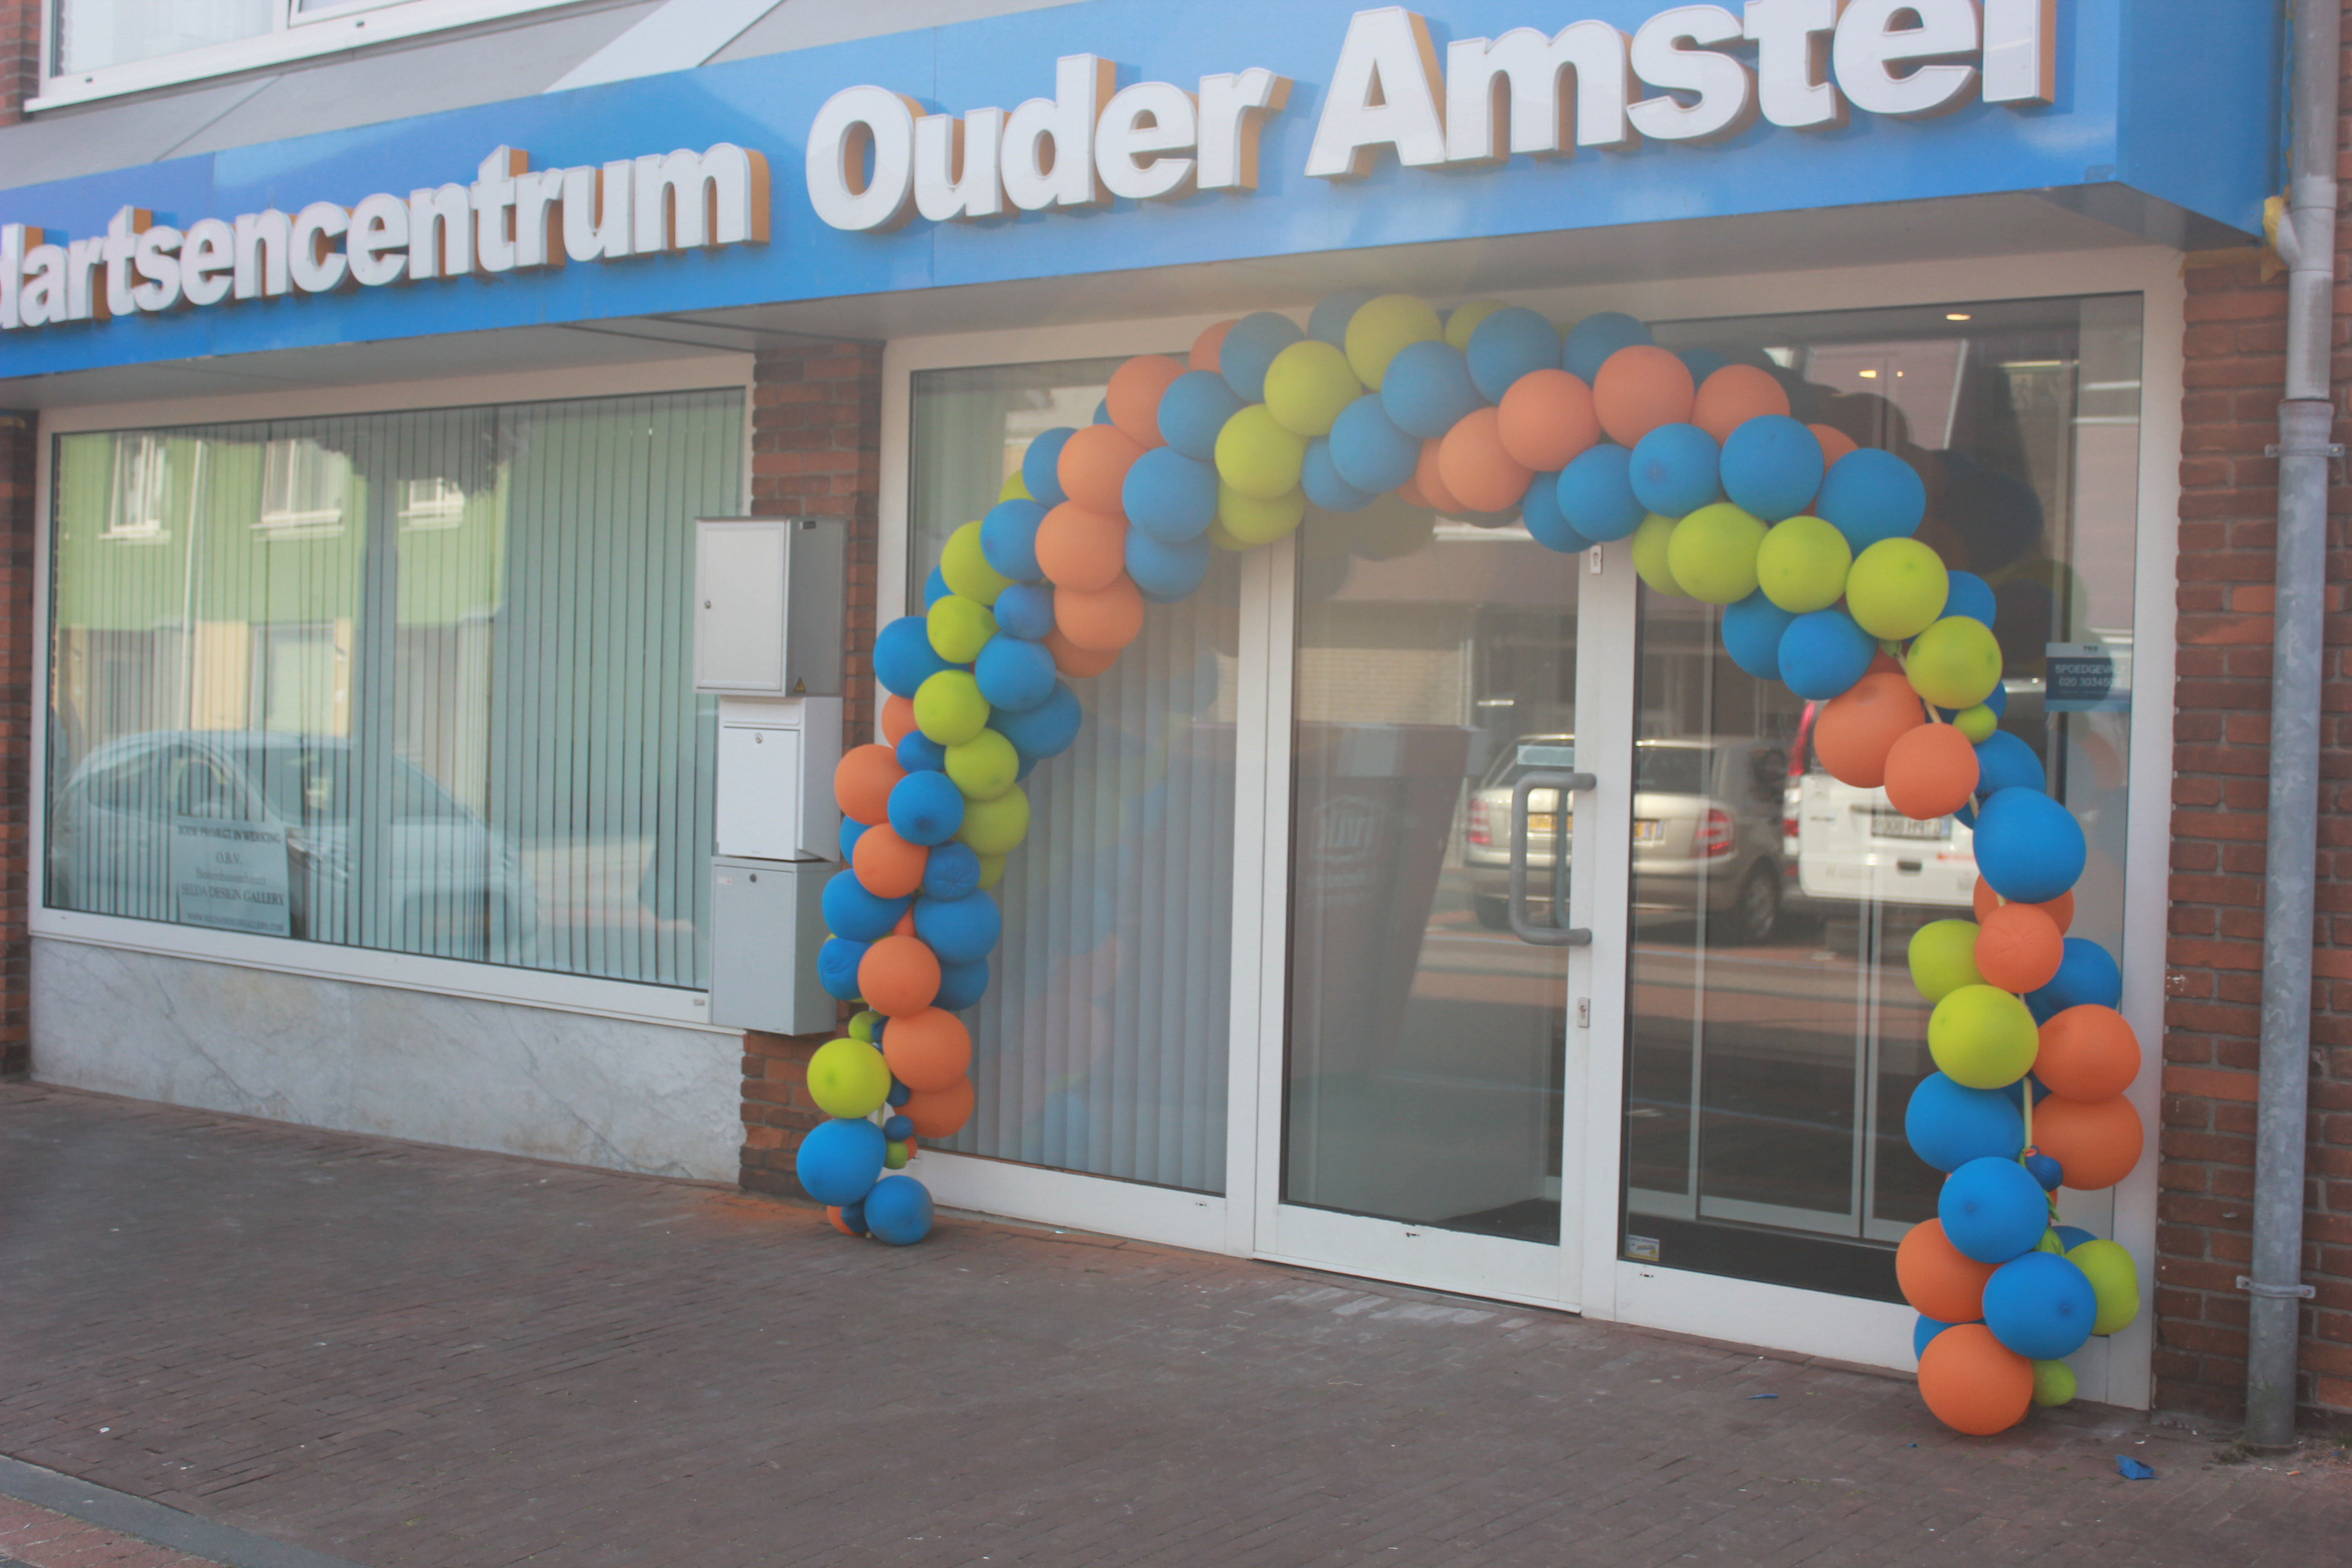 Tandartspraktijk in Ouderkerk aan de Amstel